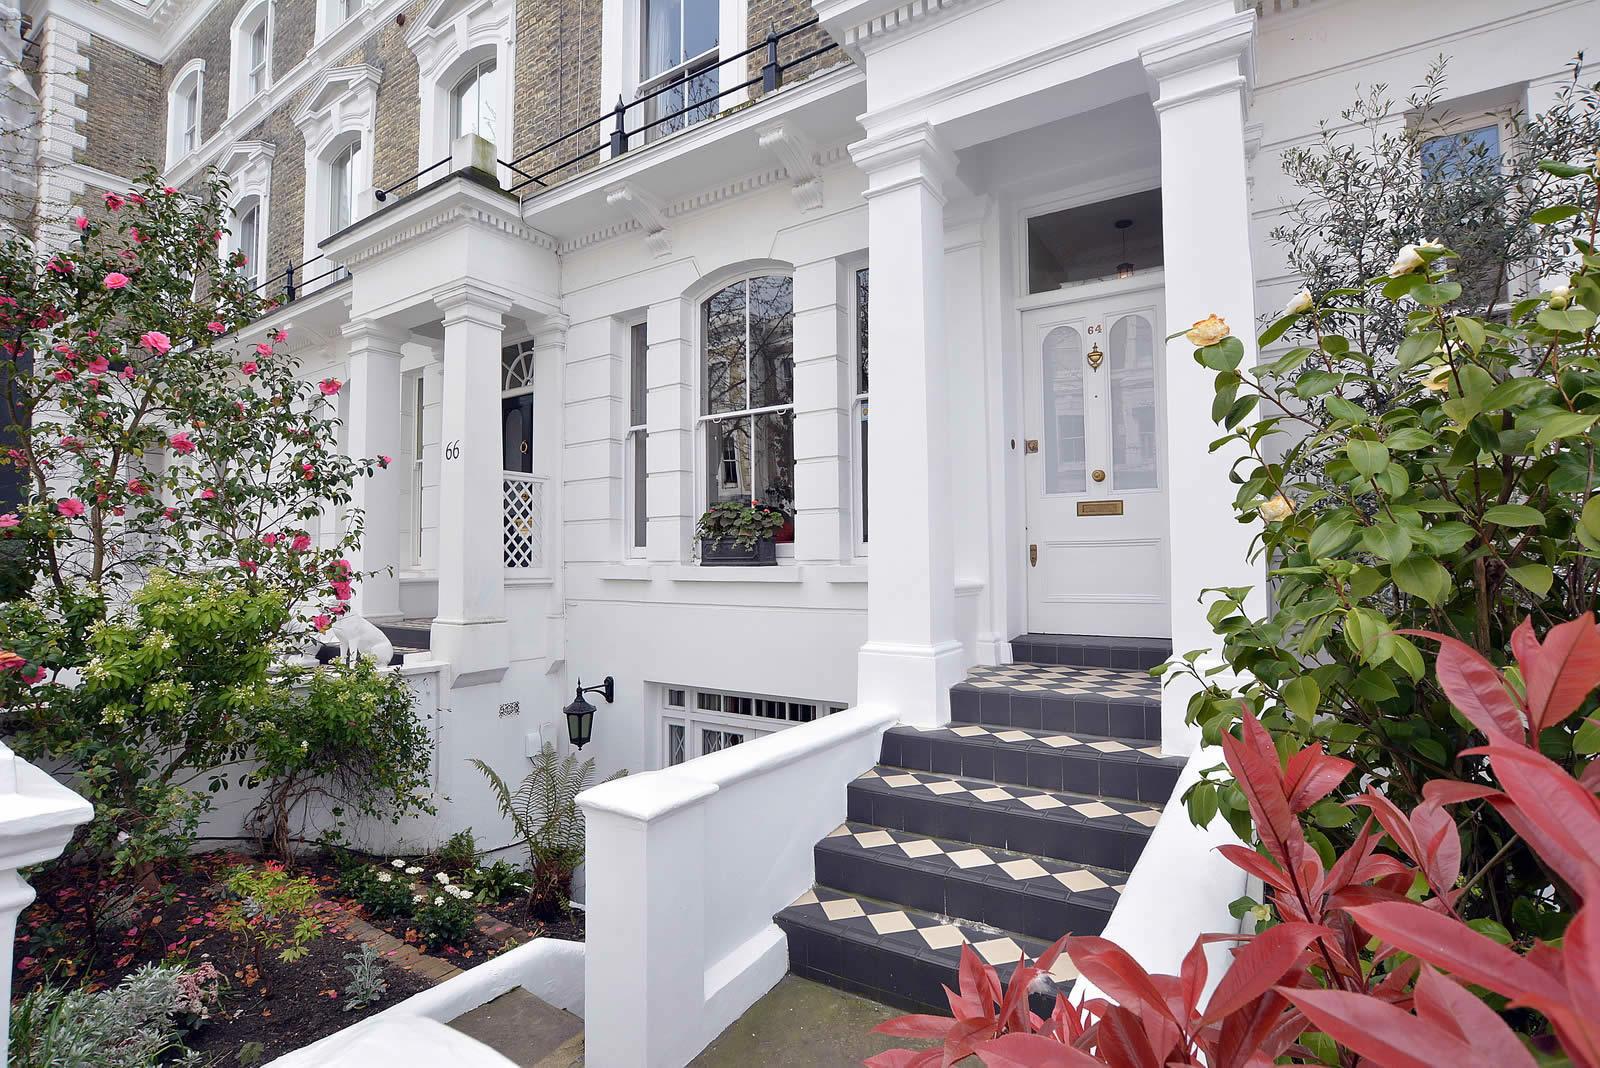 maison-familiale-a-vendre-kensington-terrasses-jardin-privatif-cheminee